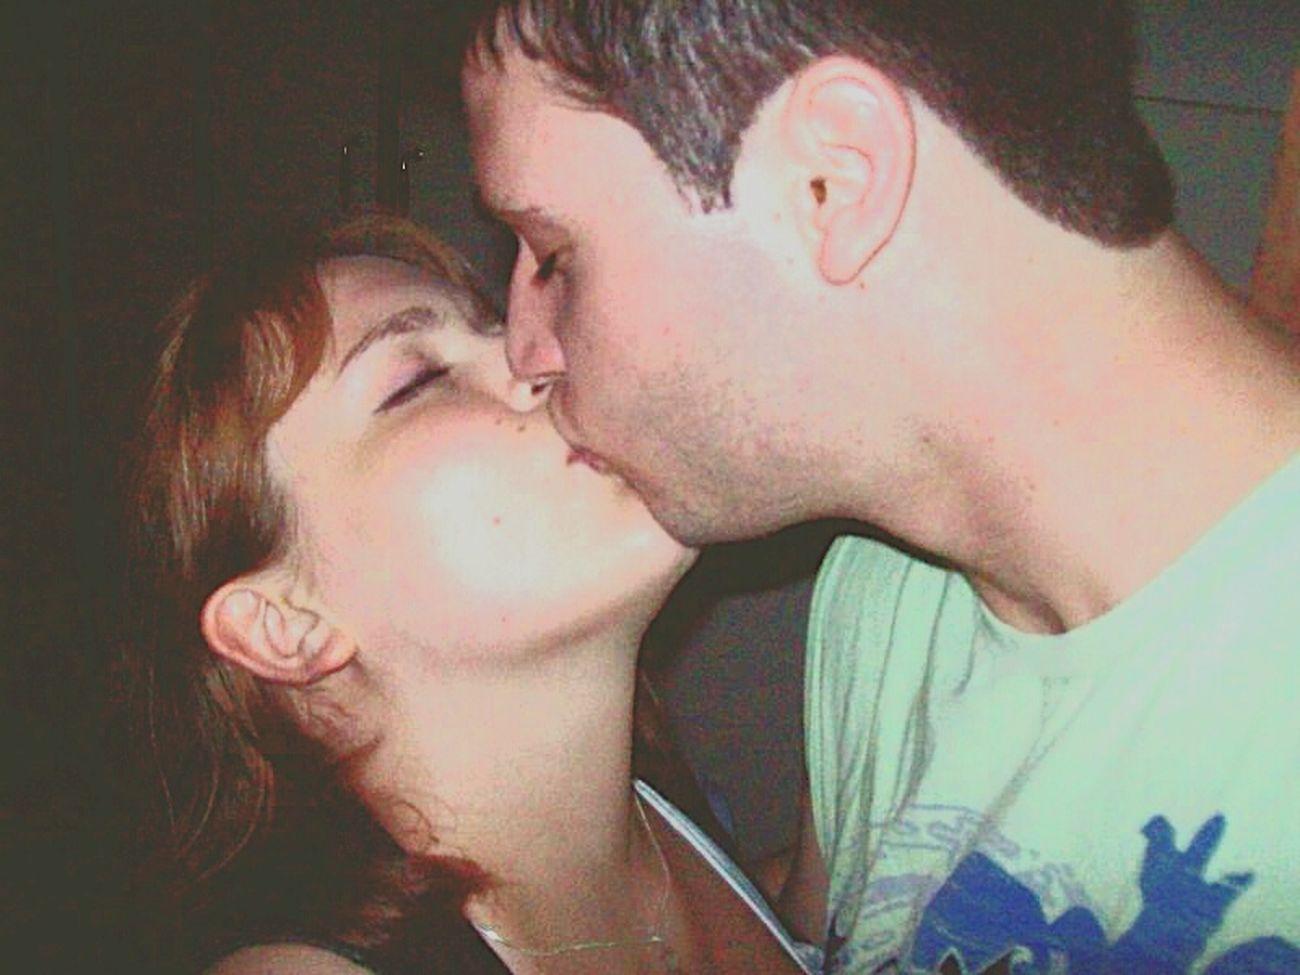 Summer Views Love In The Air Romance Just Married Boy Friend Girl Friend Namorado Namorada Marido&Mulher